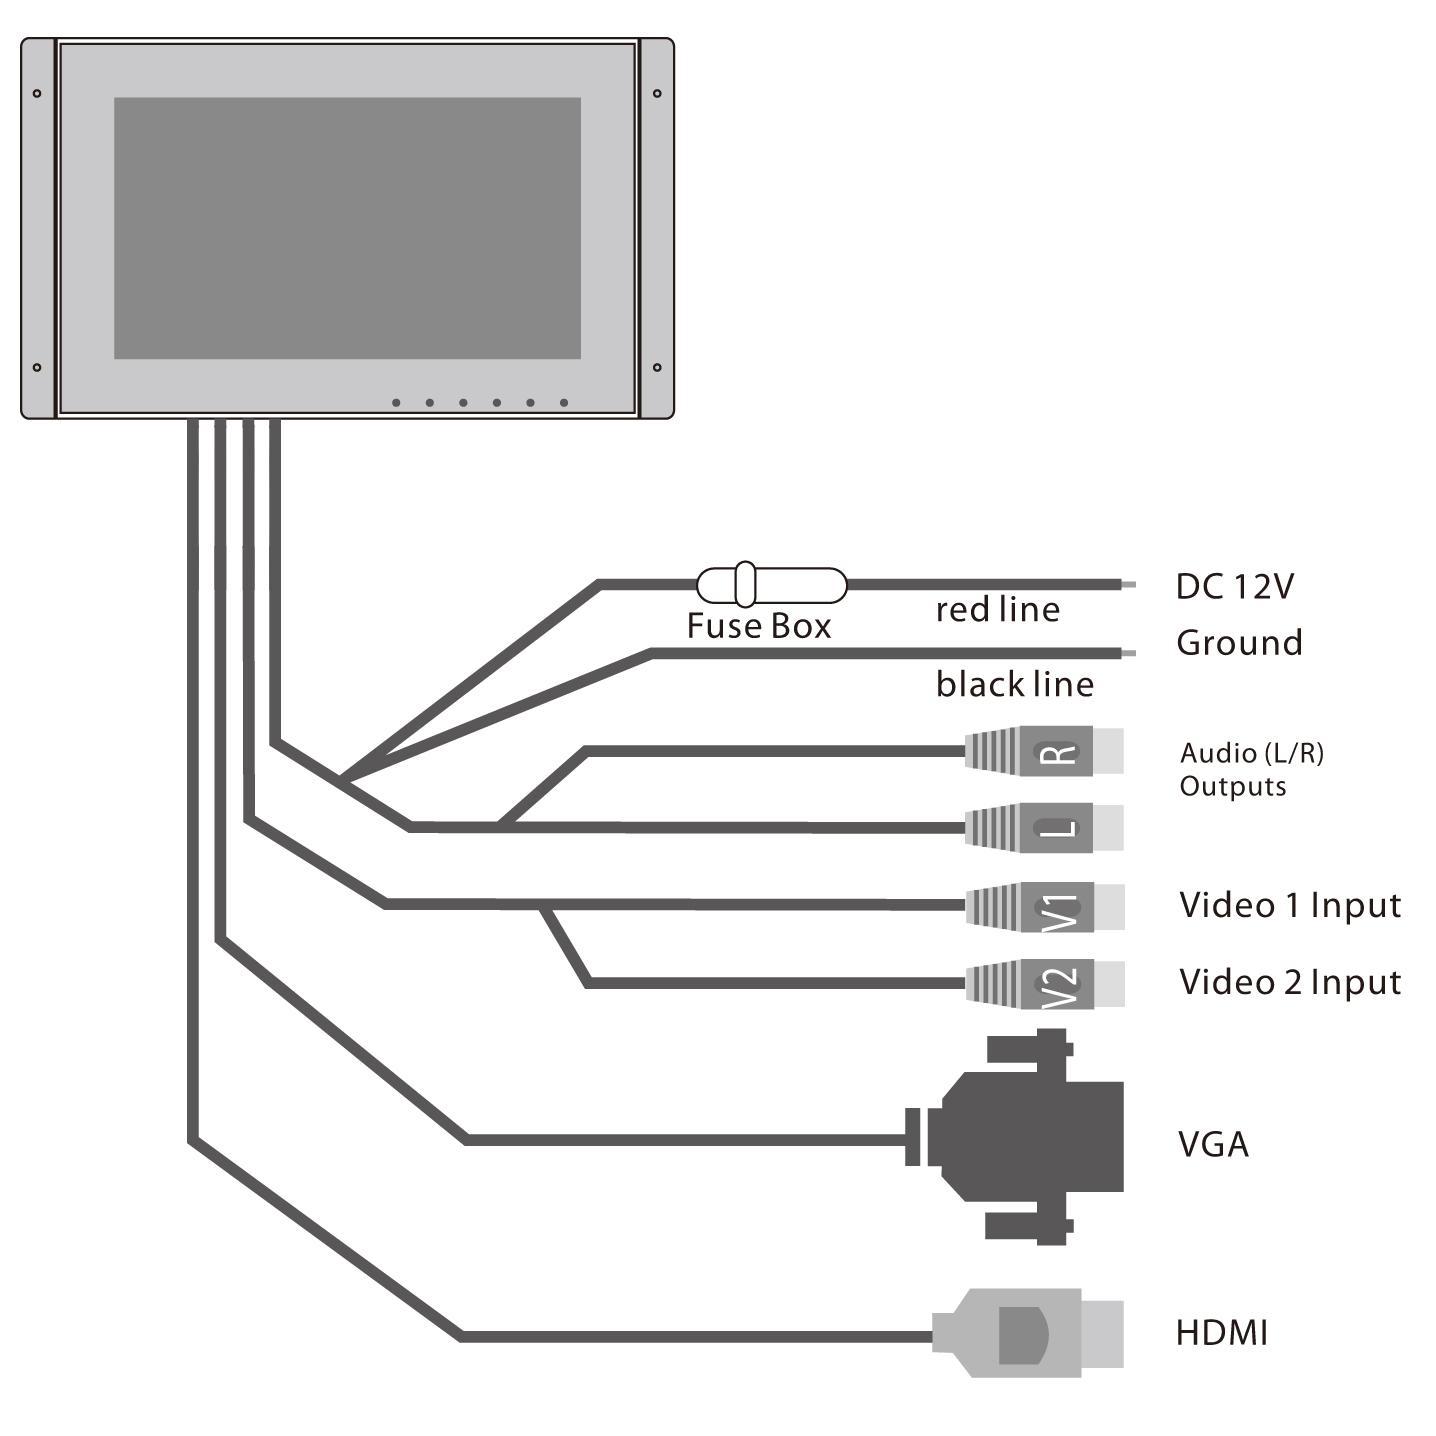 pyle 19 39 39 video monitor panel display screen. Black Bedroom Furniture Sets. Home Design Ideas